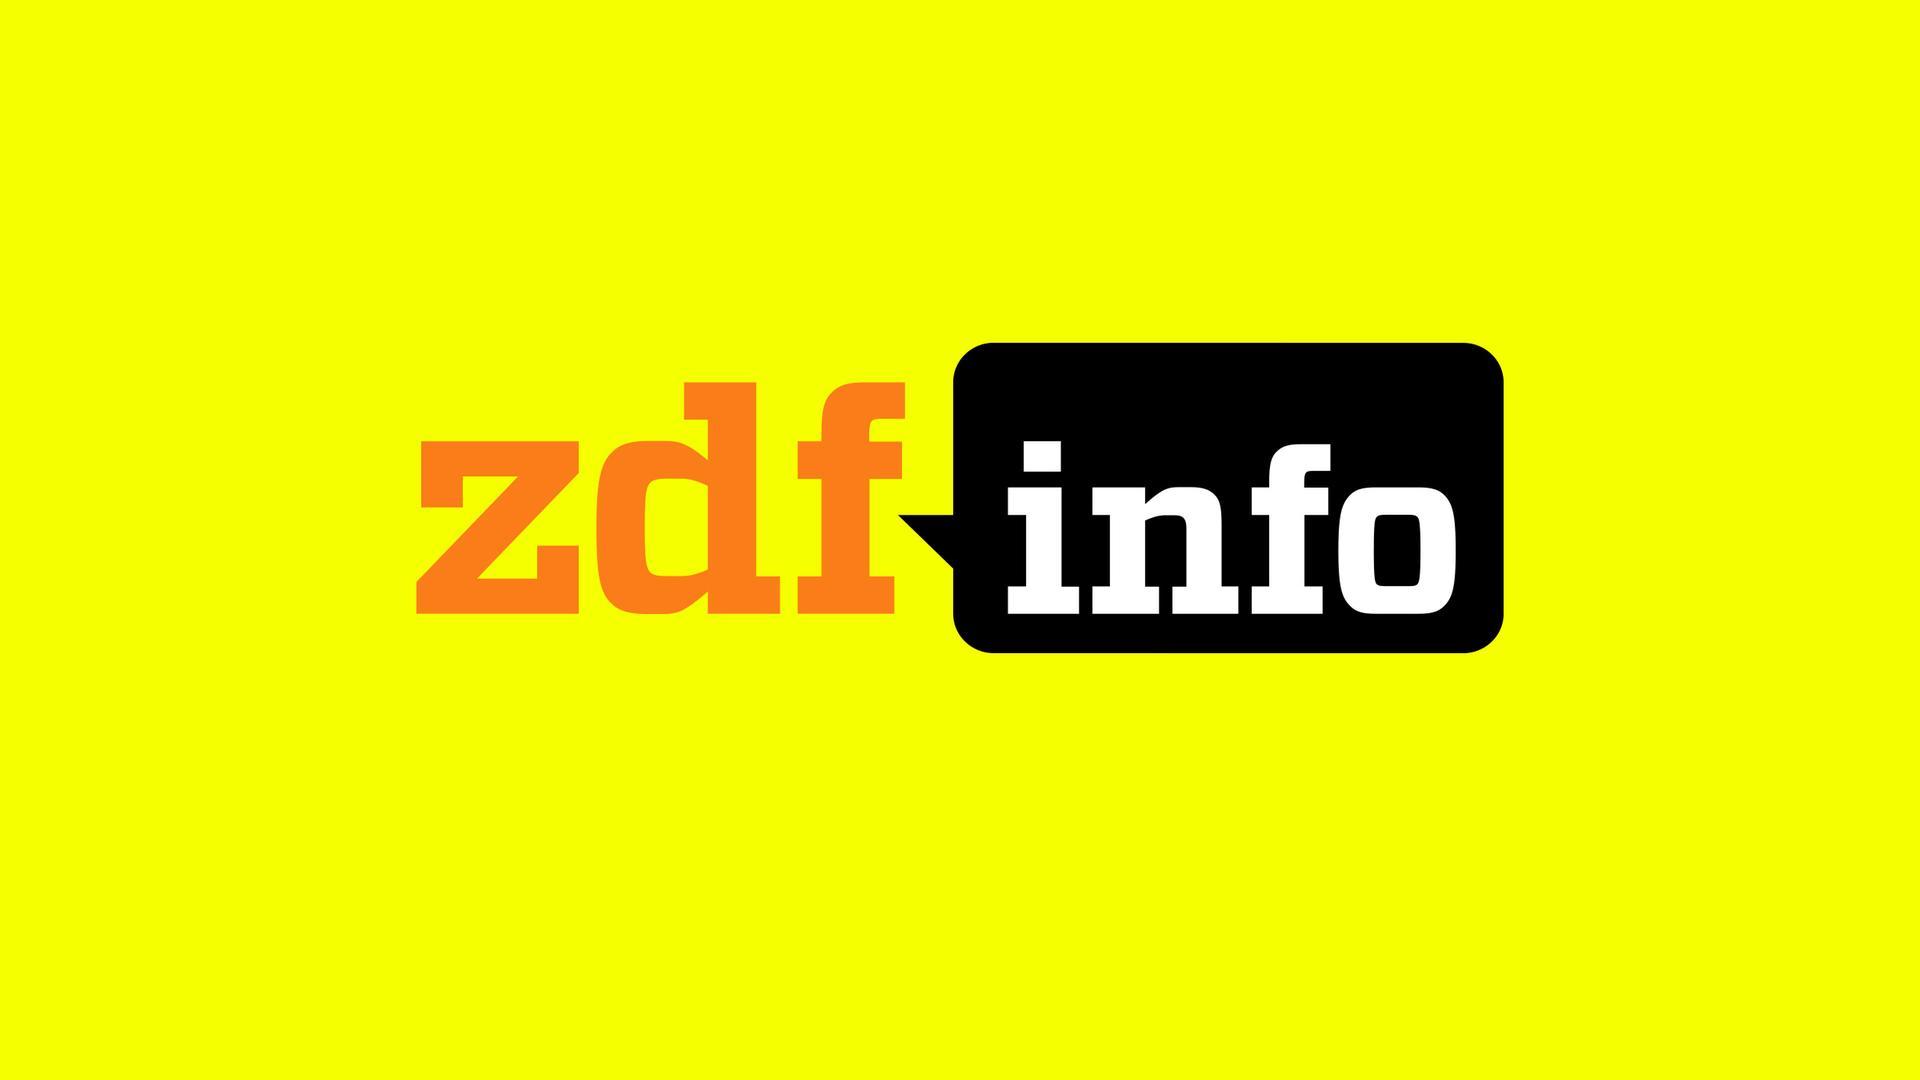 Cl Zdf